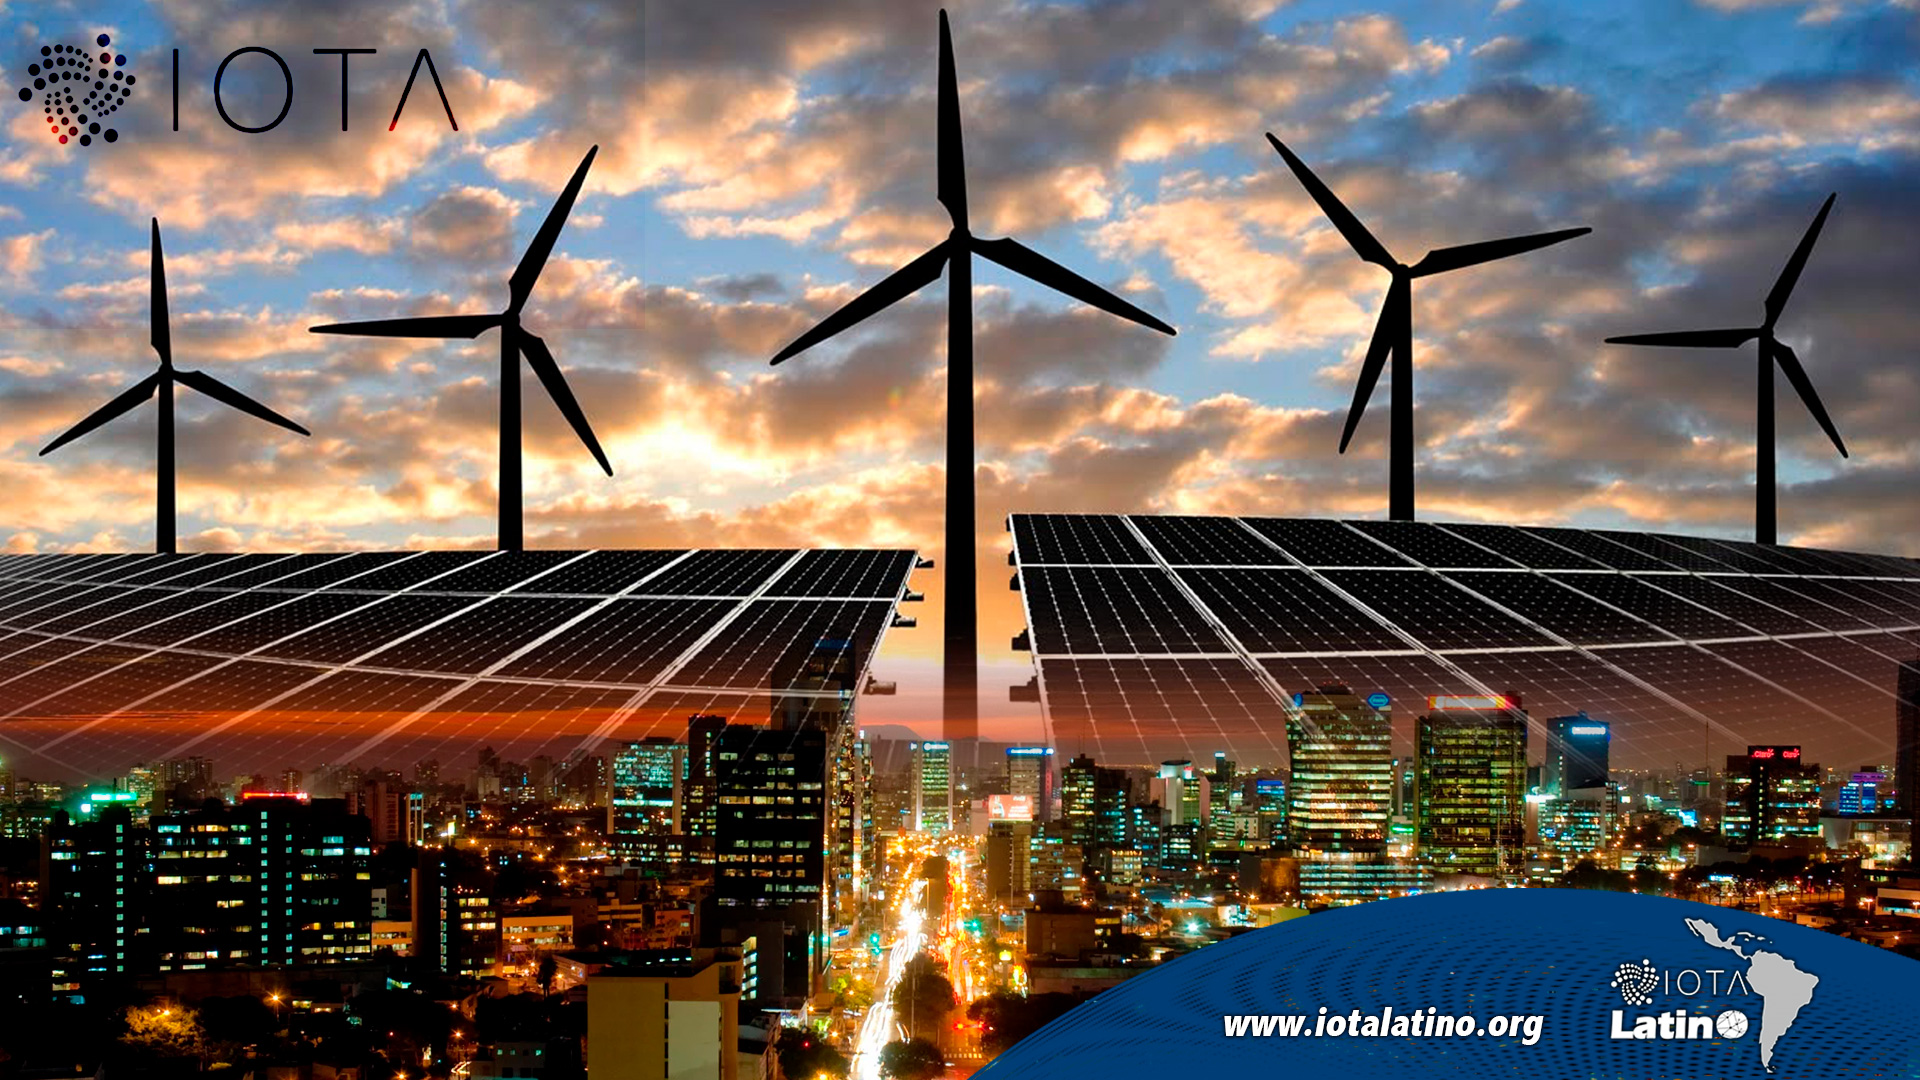 Ciudades con energía renovable - IOTA Latino